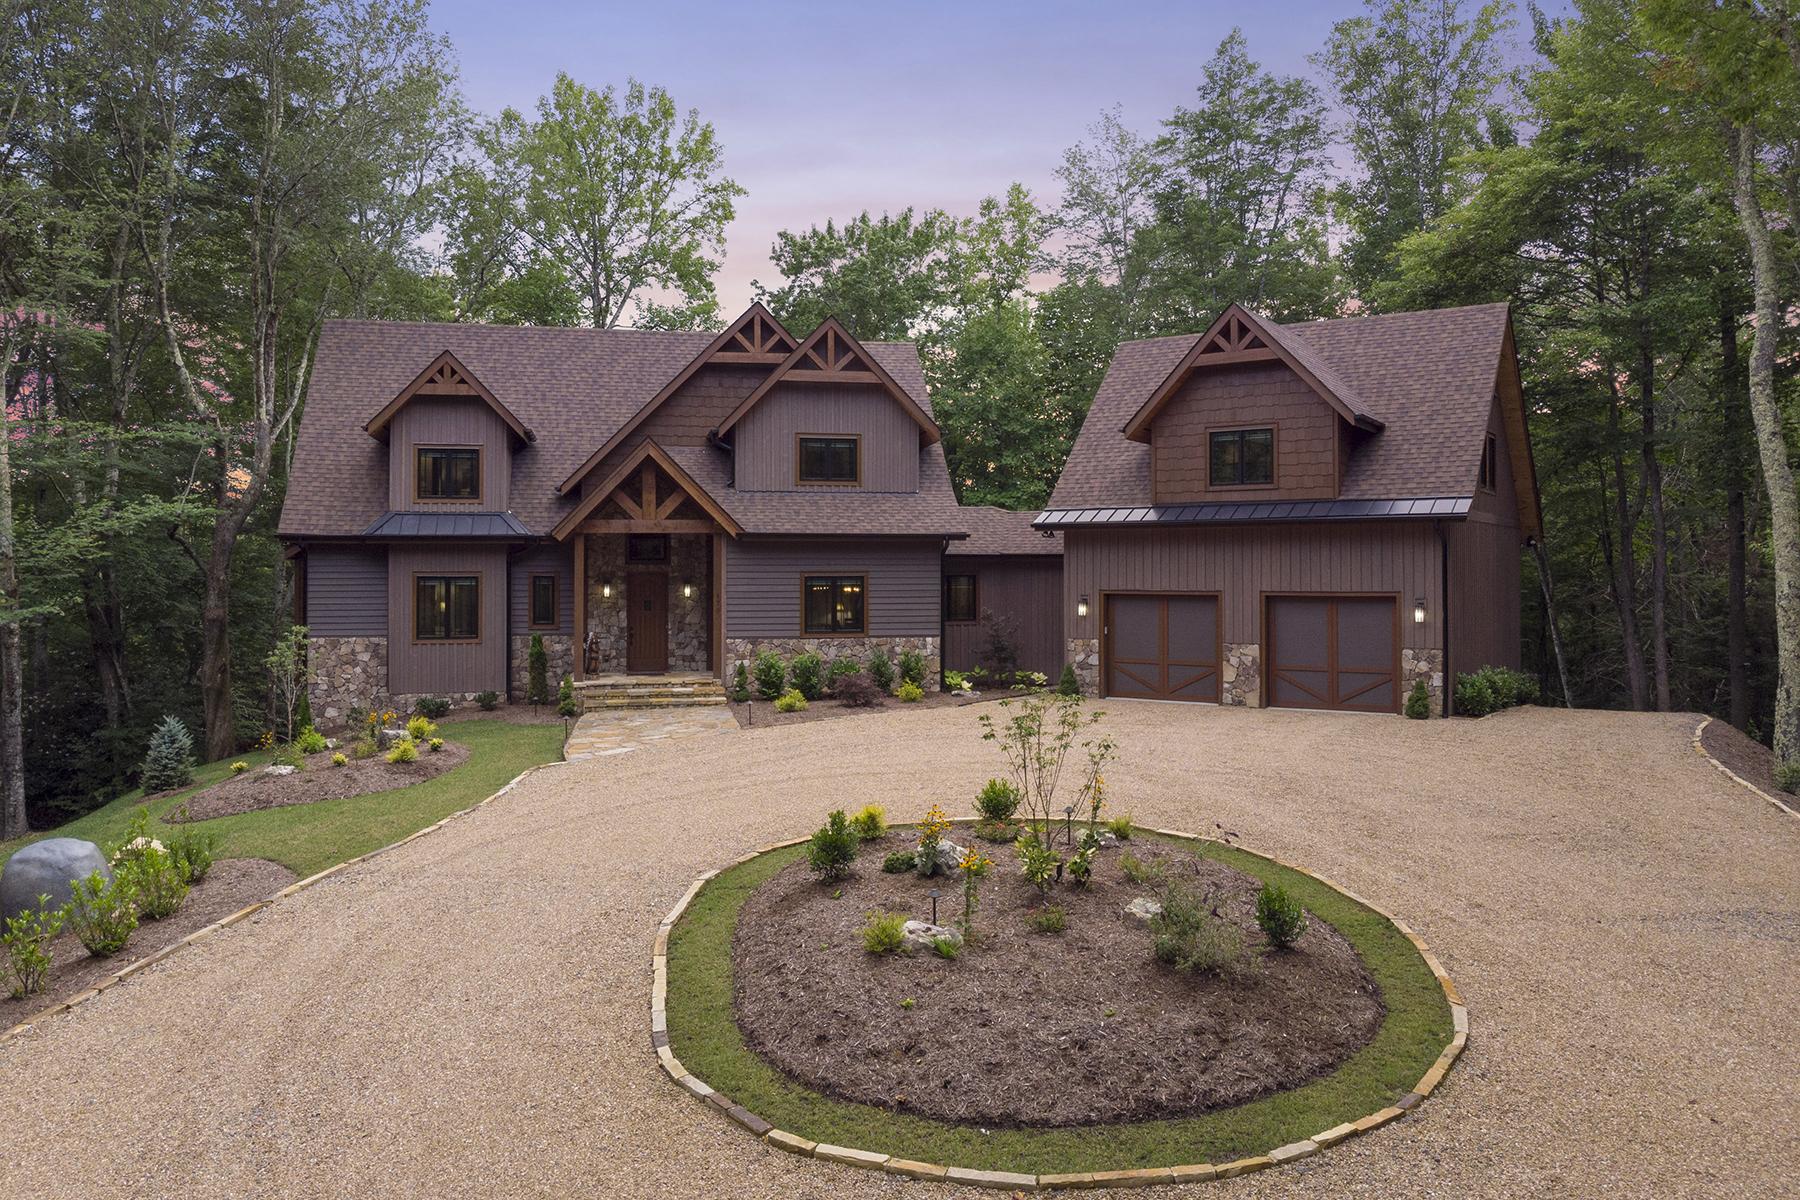 Single Family Homes vì Bán tại BANNER ELK - THE LODGES AT EAGLES NEST 170 Fire Fly Cv, Banner Elk, Bắc Carolina 28604 Hoa Kỳ